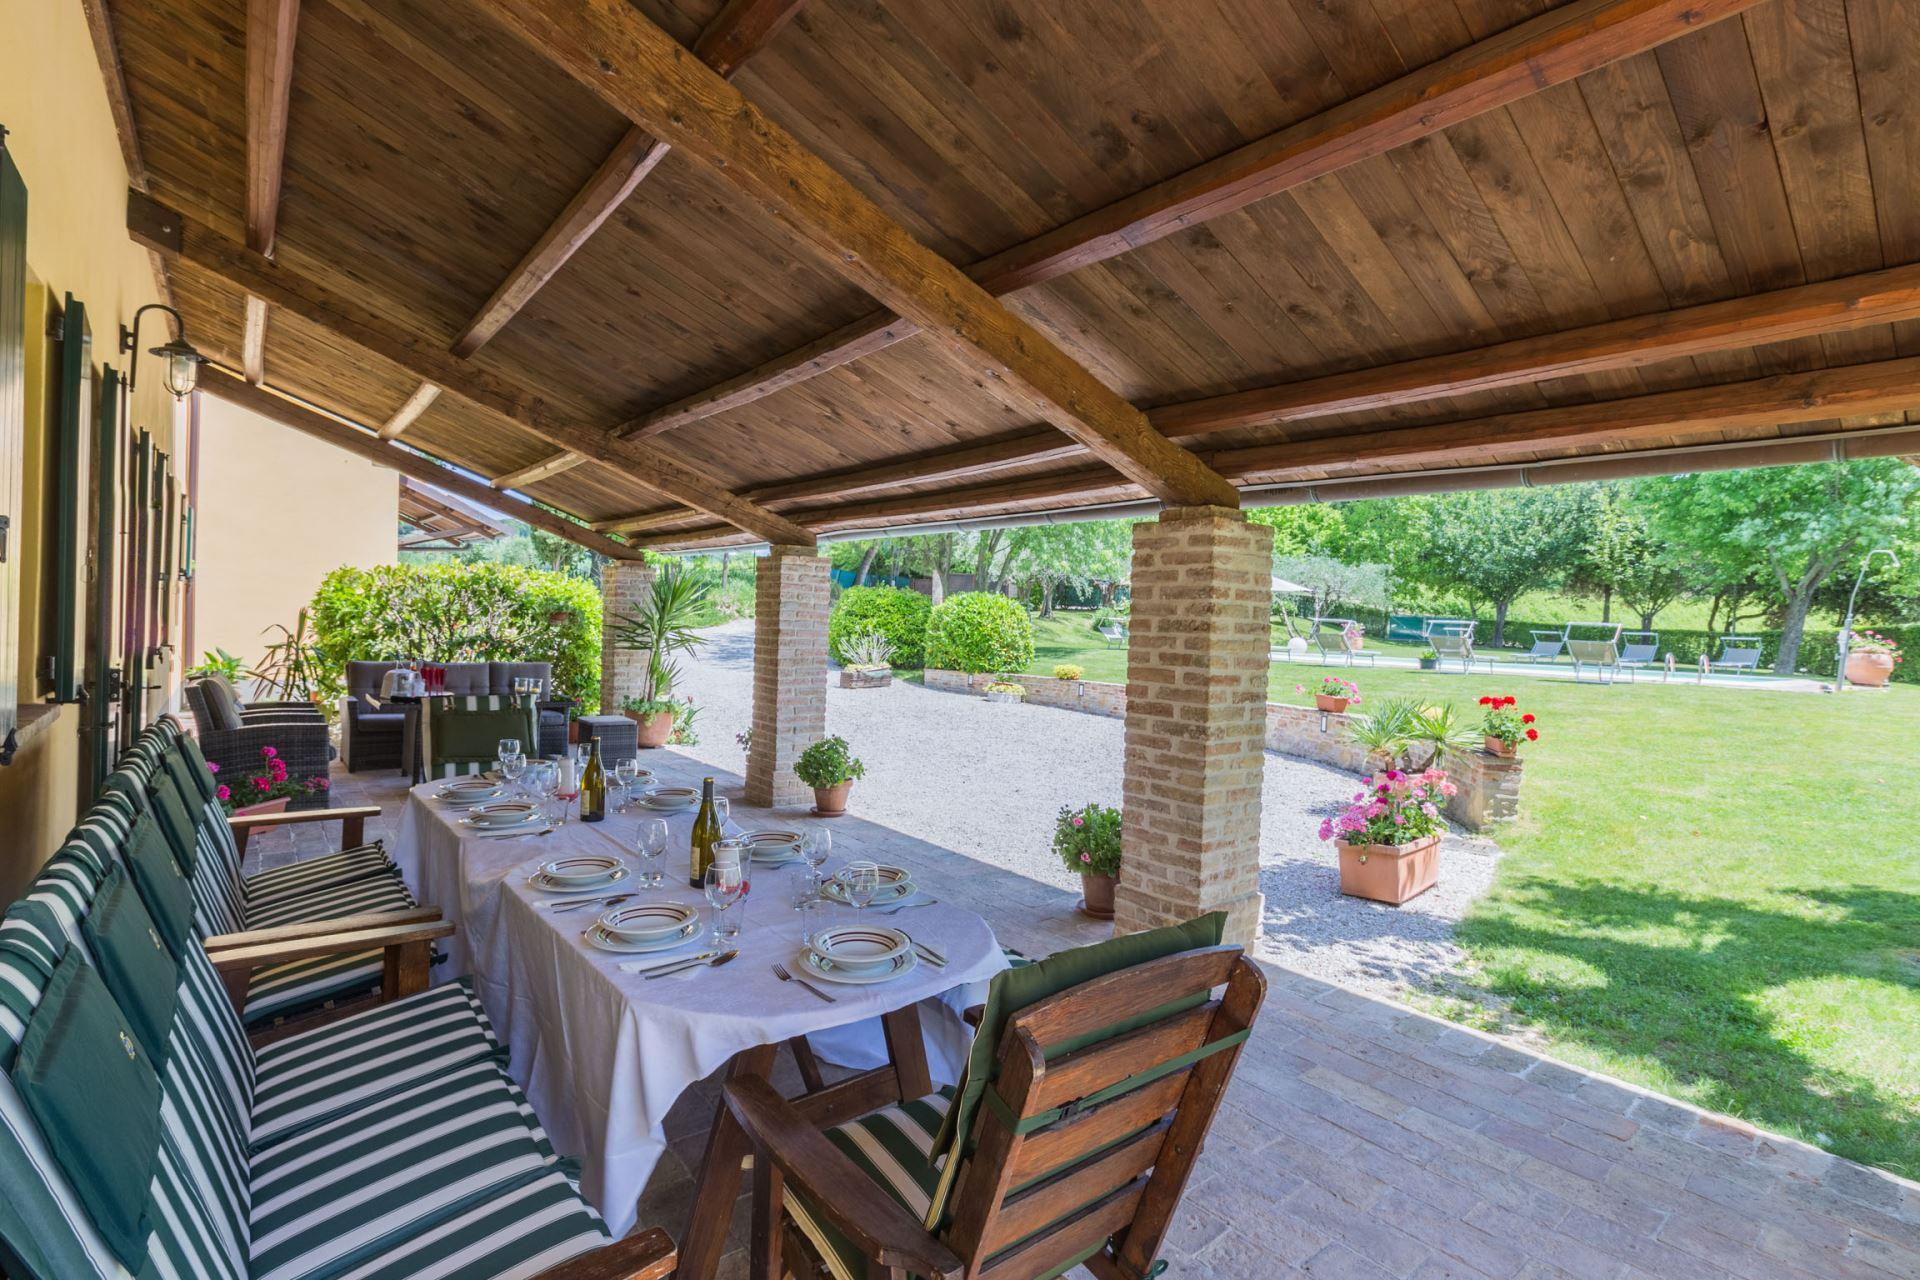 Ferienhaus VILLA DELLE VIGNE (2129909), Pesaro, Pesaro und Urbino, Marken, Italien, Bild 24